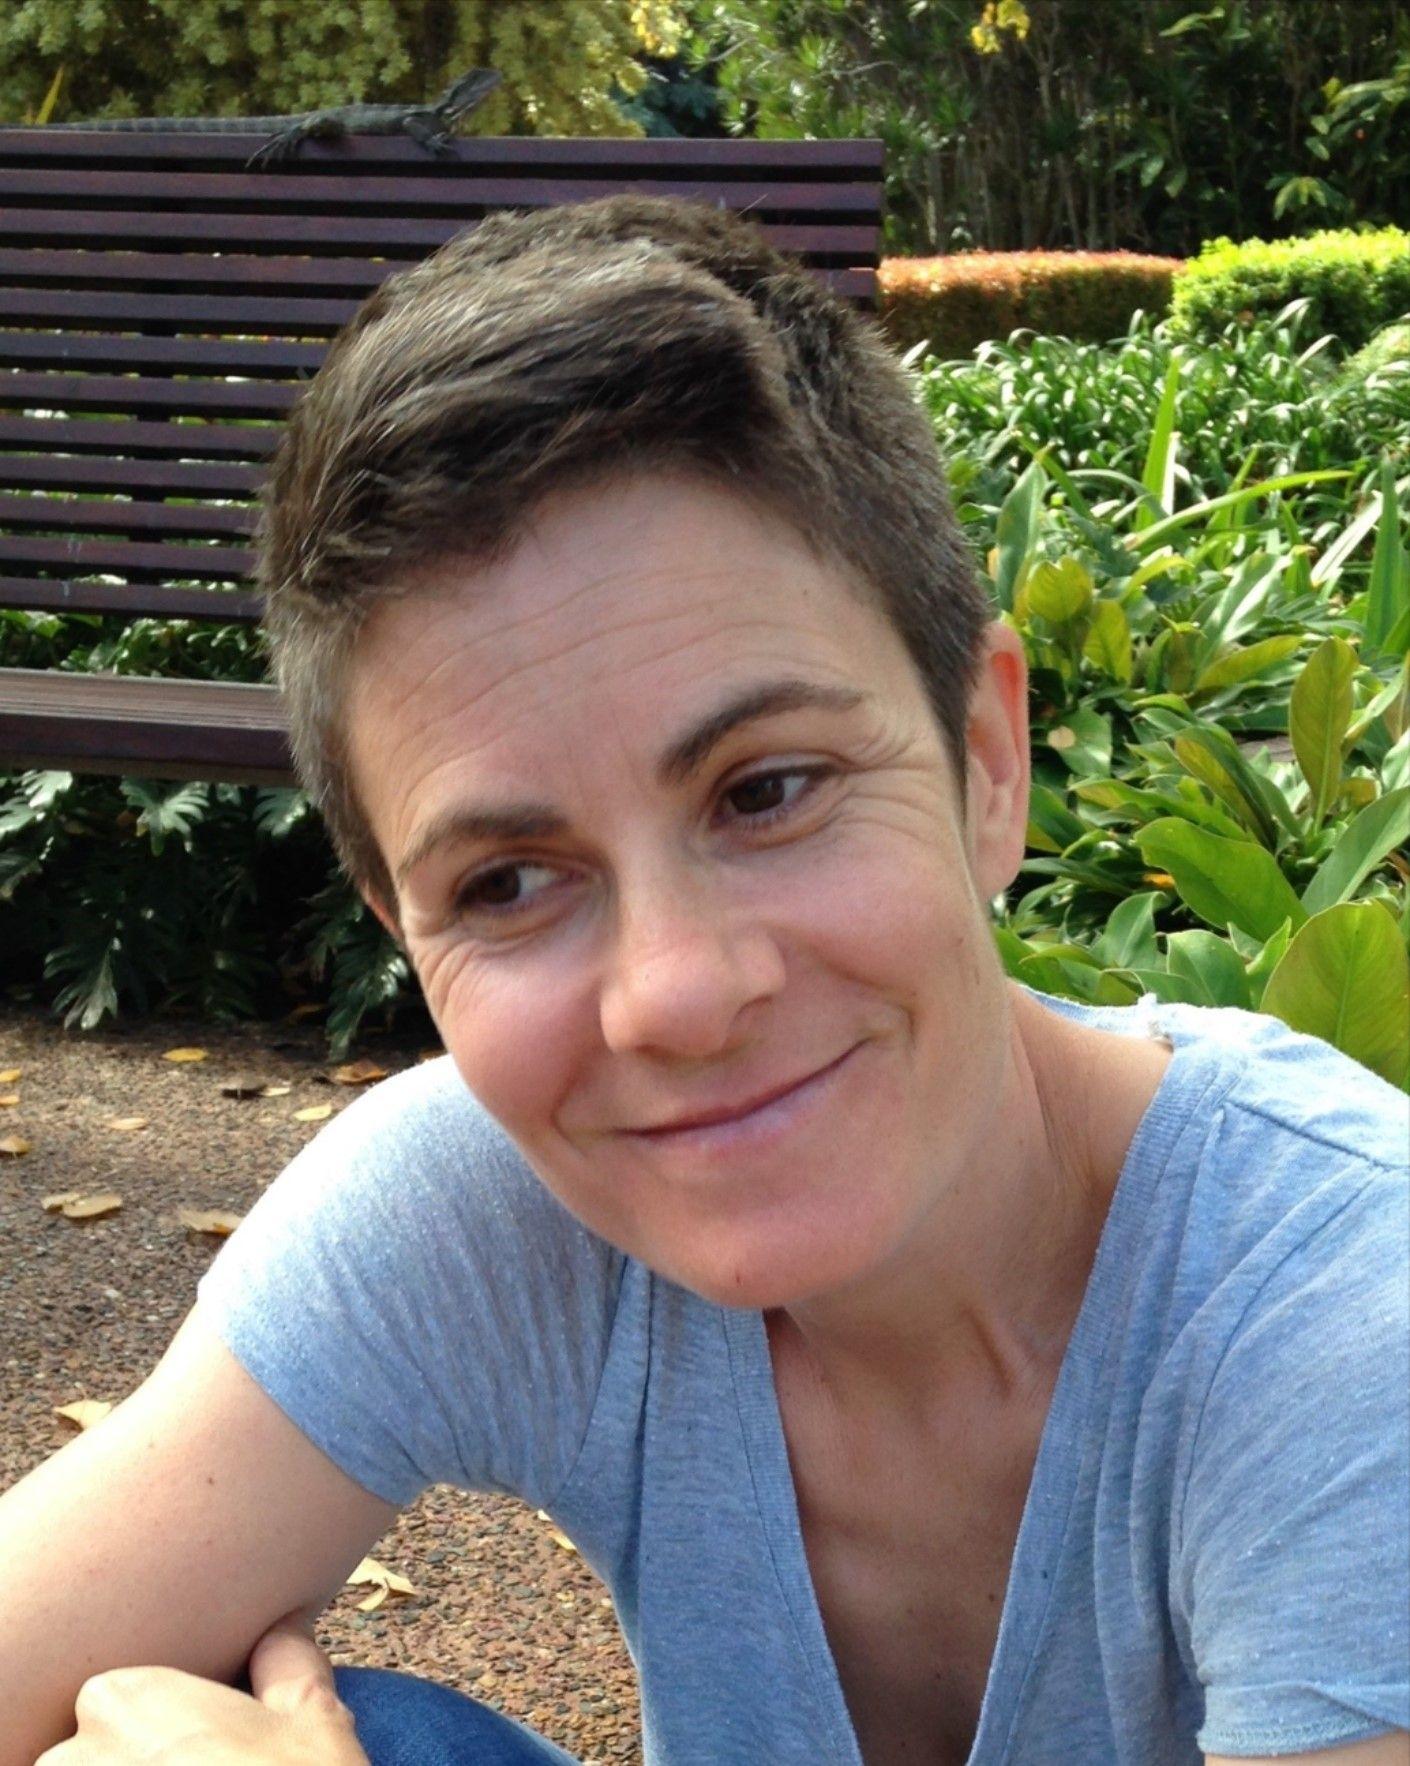 Dr Celine Frere - RESEARCH GROUP LEADERPhD (Evolutionary Biology), University of New South WalesBSc. Hons I, University of QueenslandEXPERTISE: GENETICS, GENOMICS, ANIMAL BEHAVIOURGoogle Scholar profile